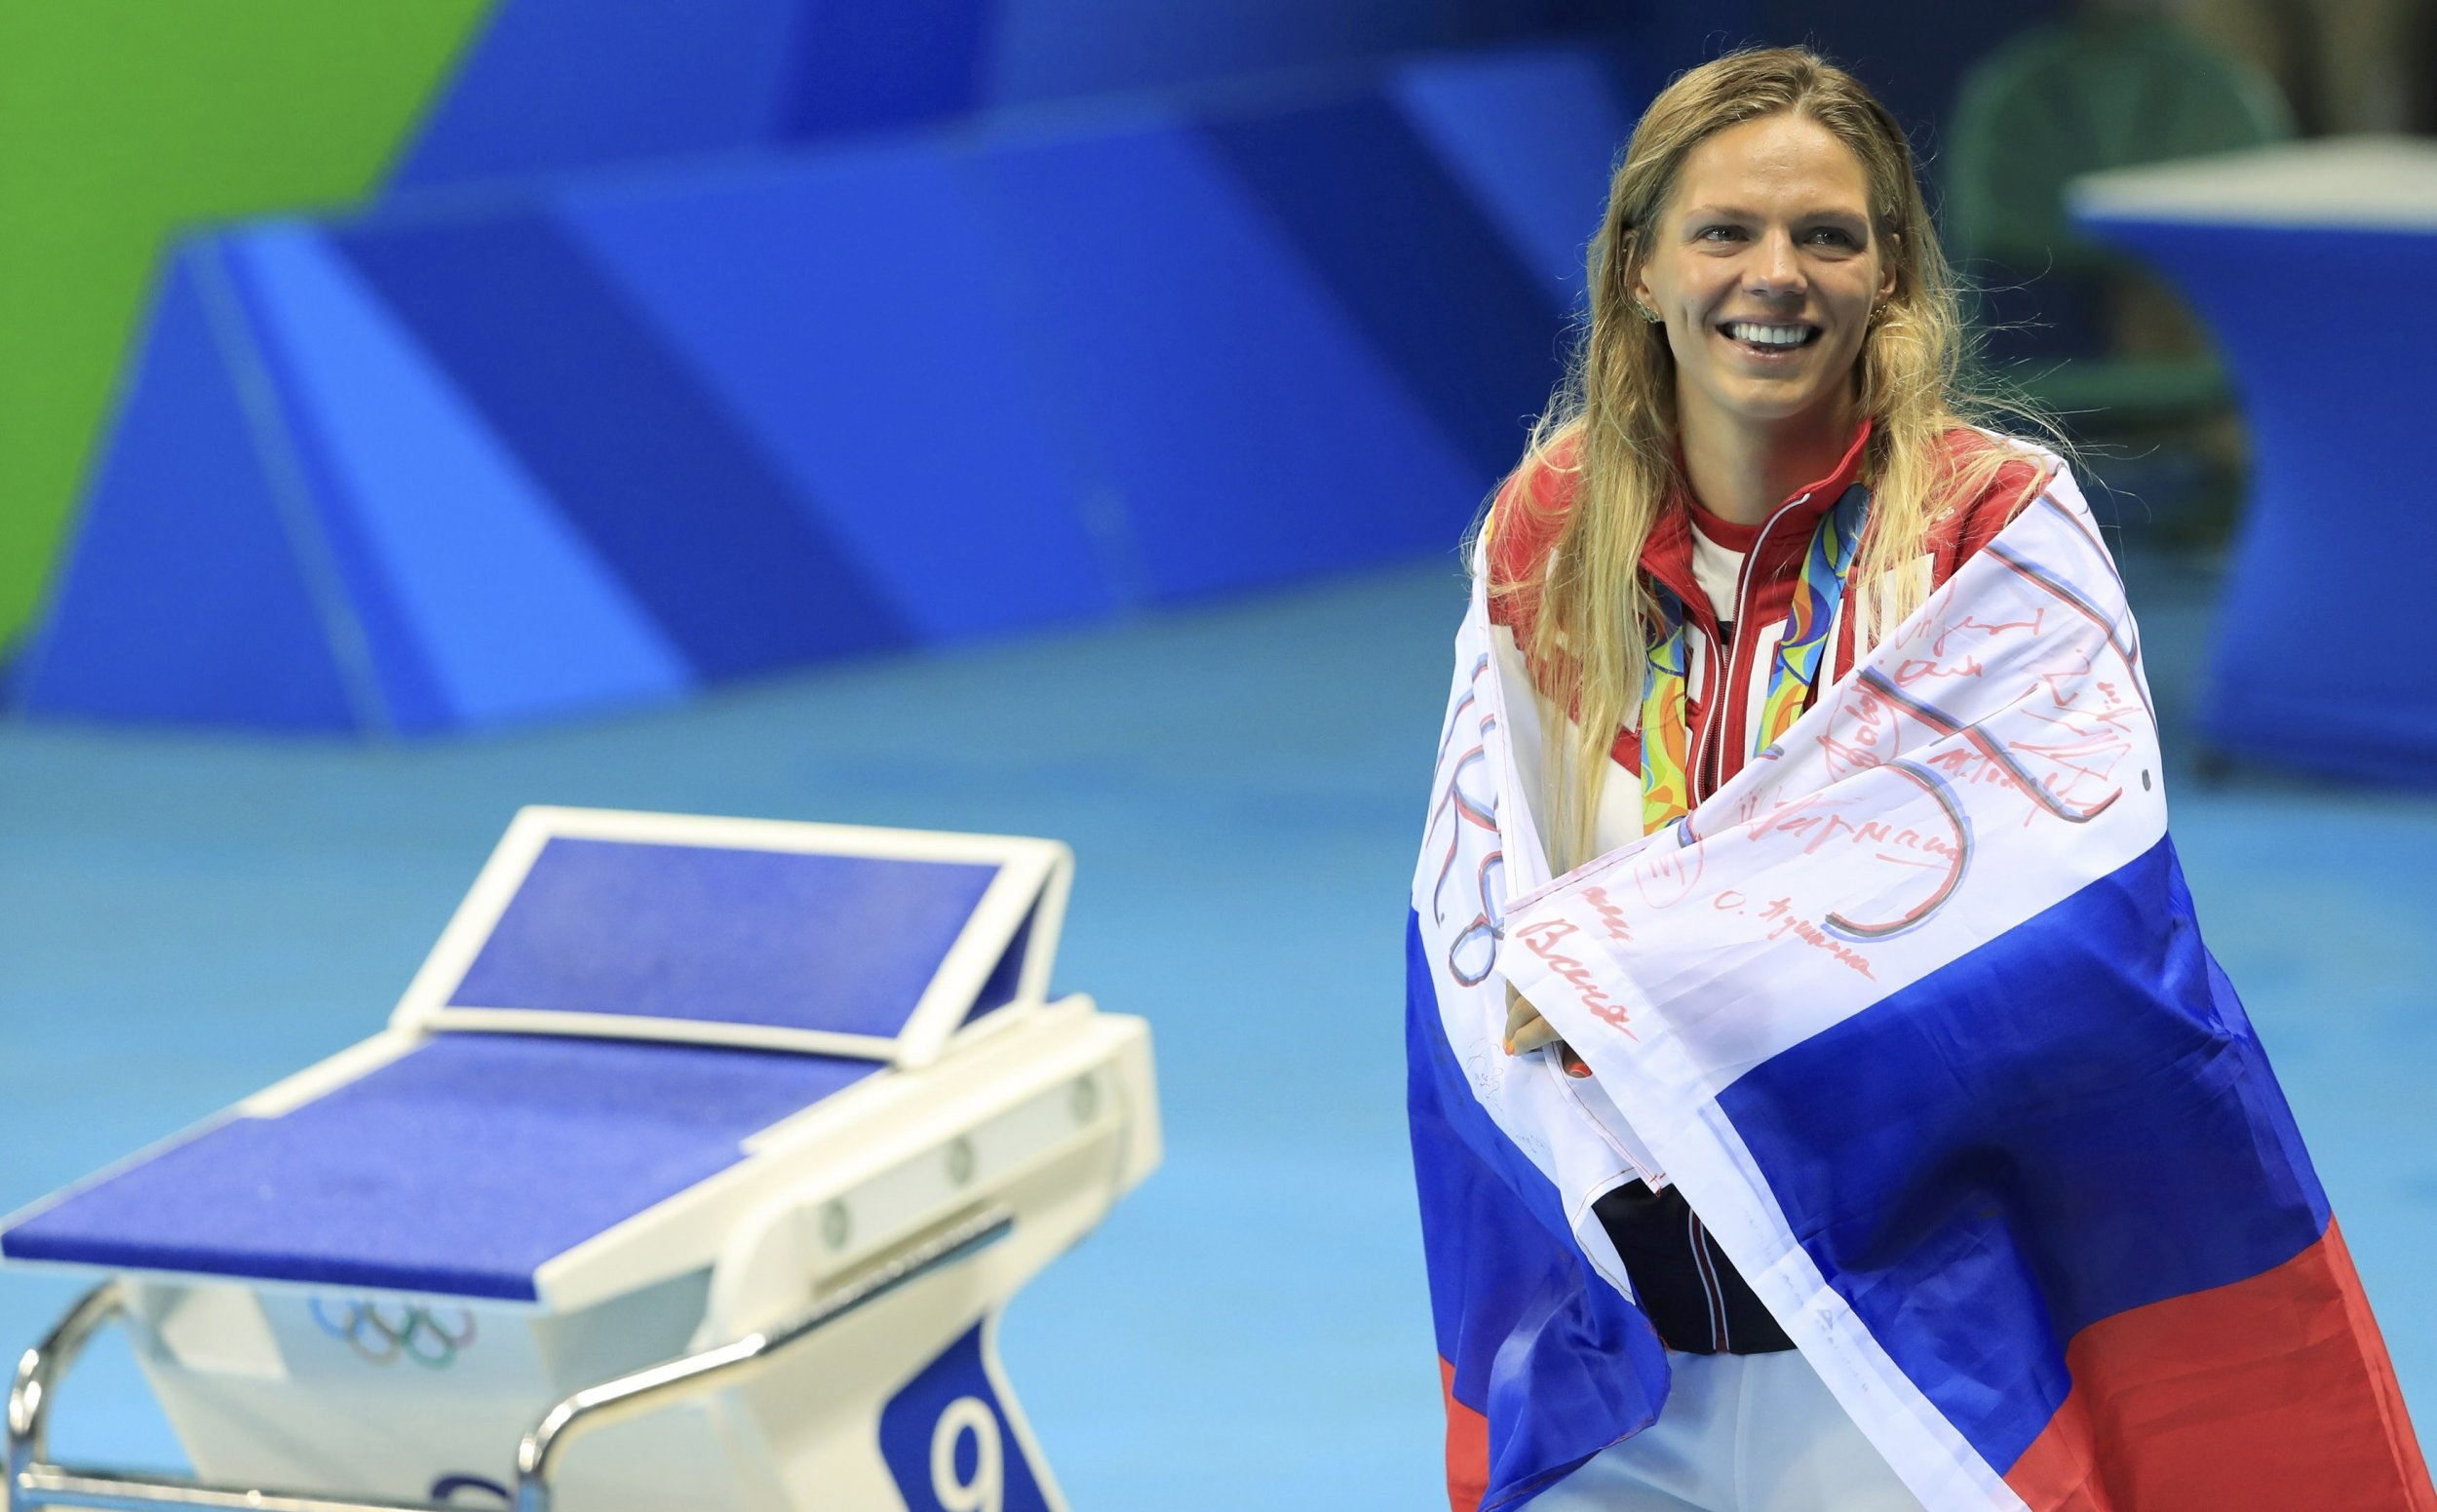 Yulia Efimova